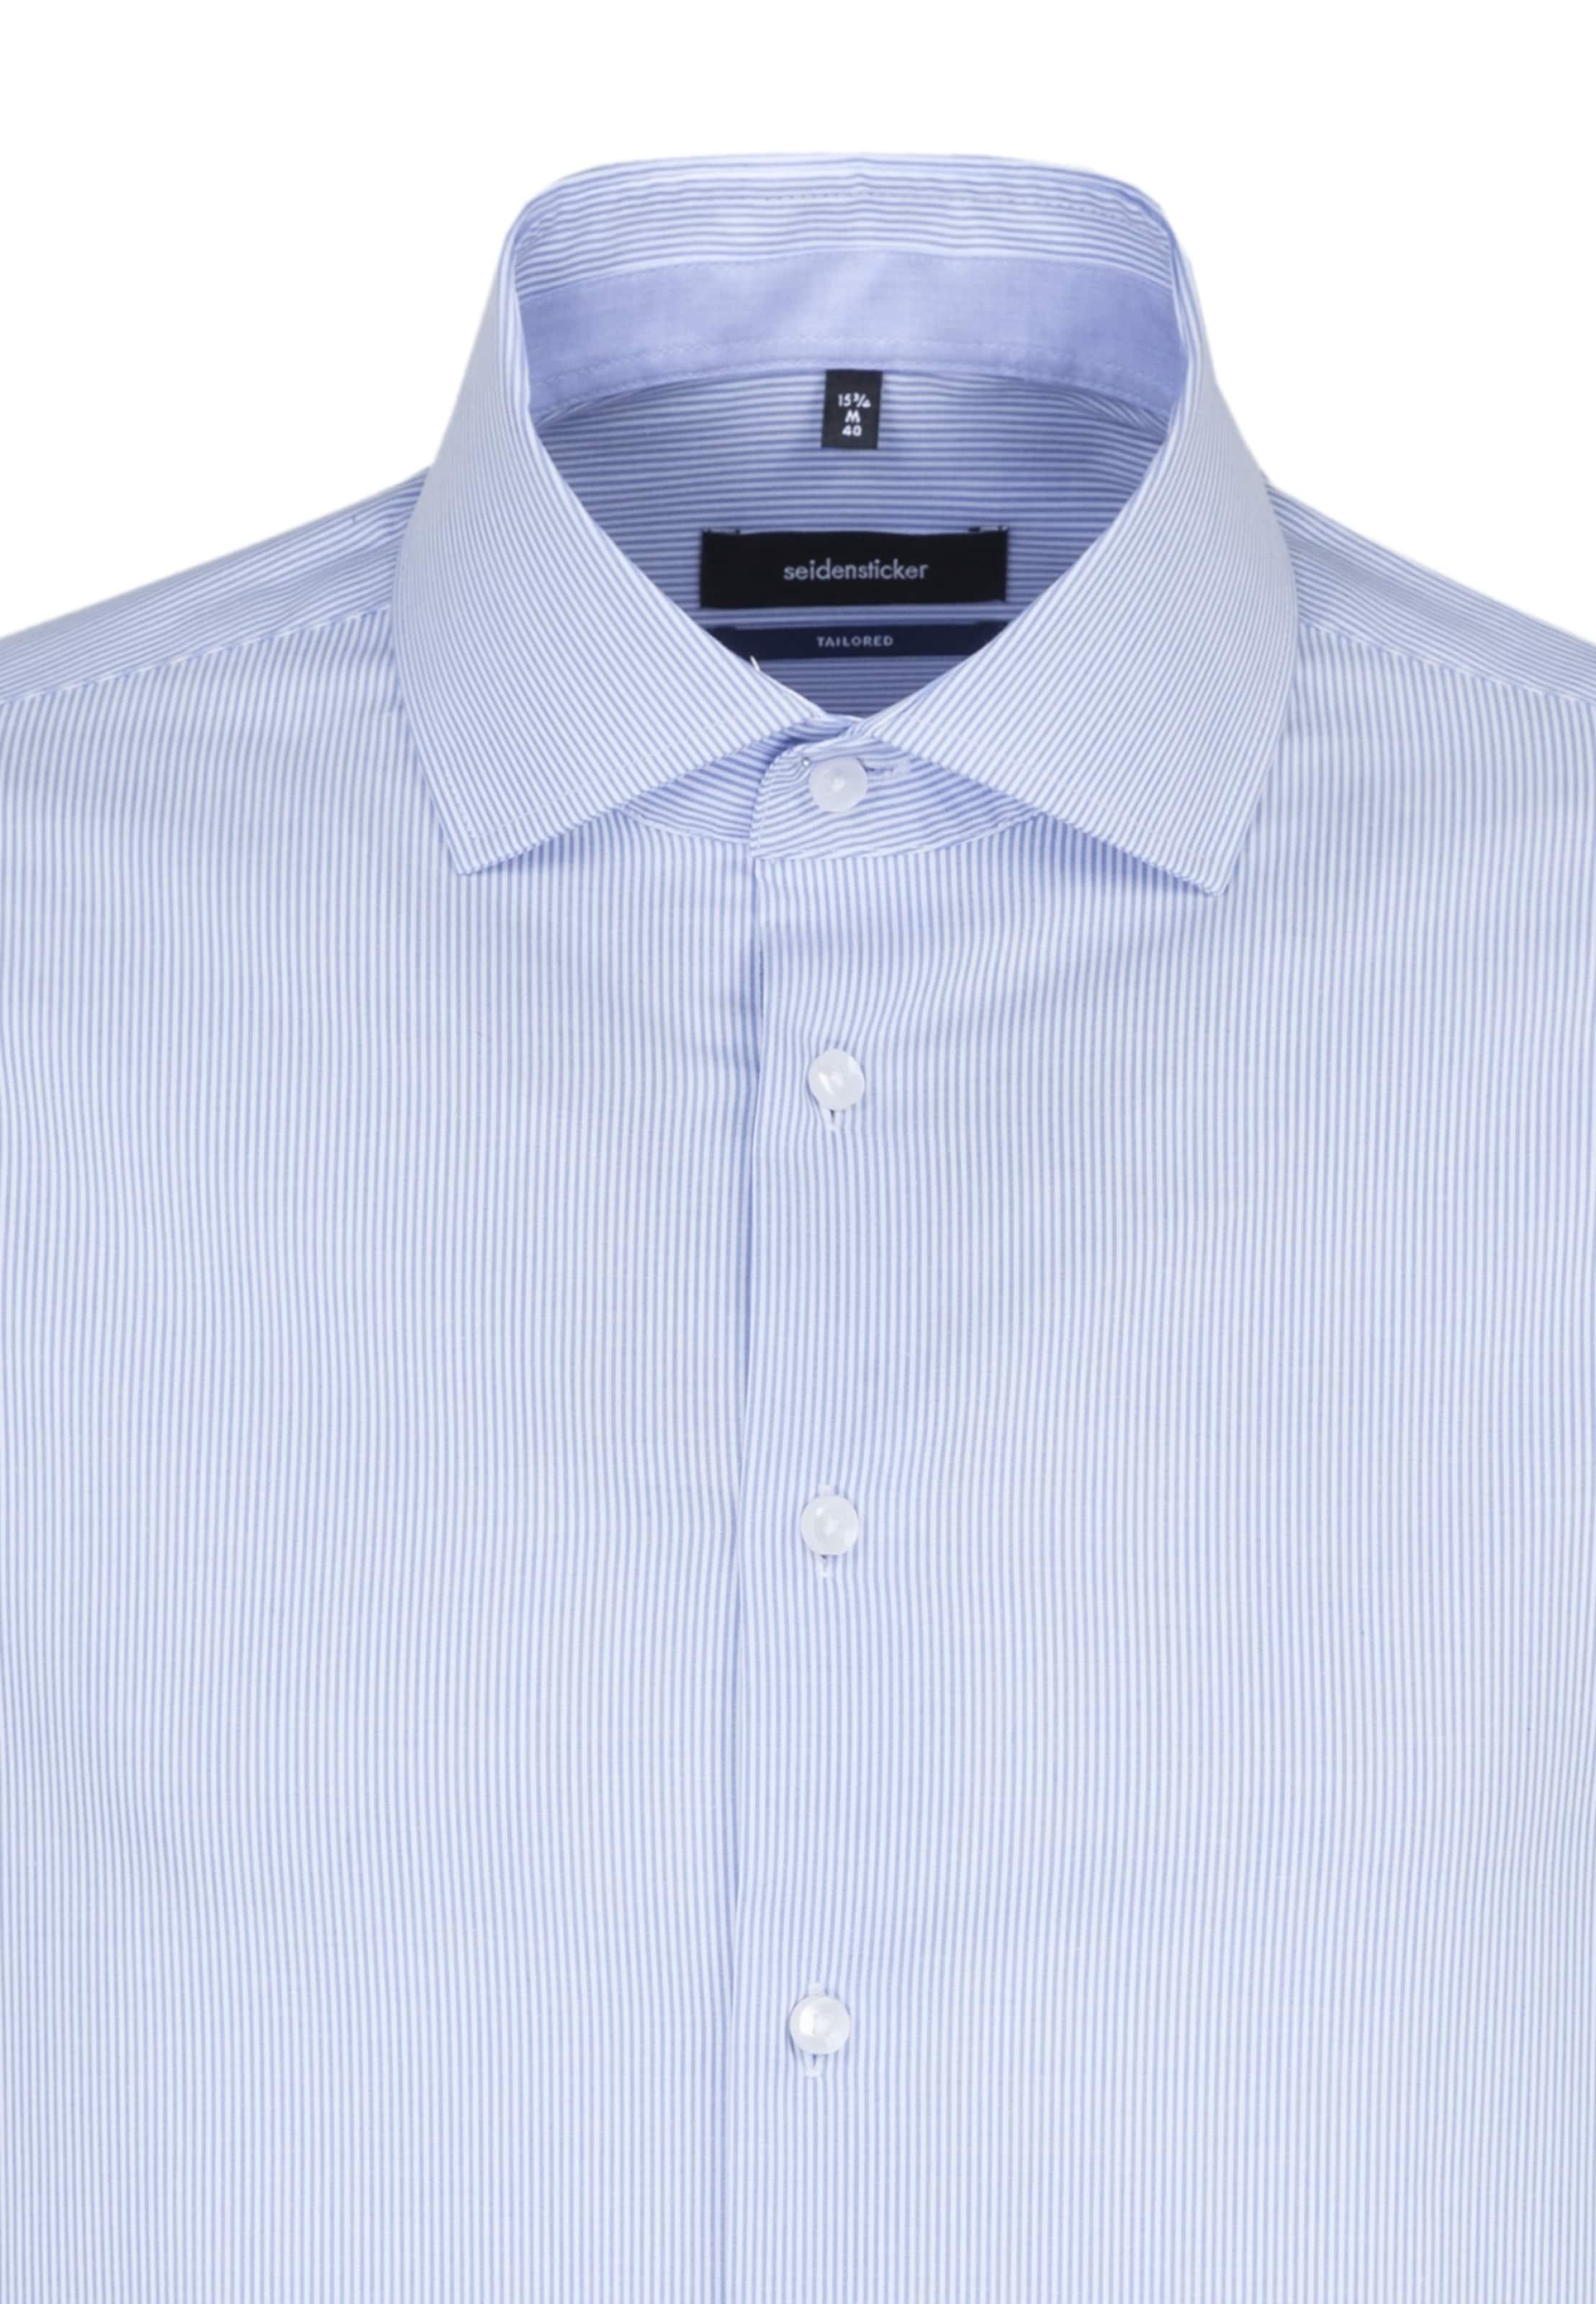 HellblauWeiß HellblauWeiß In Hemd Seidensticker Hemd Hemd Seidensticker Seidensticker In Hemd In Seidensticker In HellblauWeiß l5uTc3FK1J